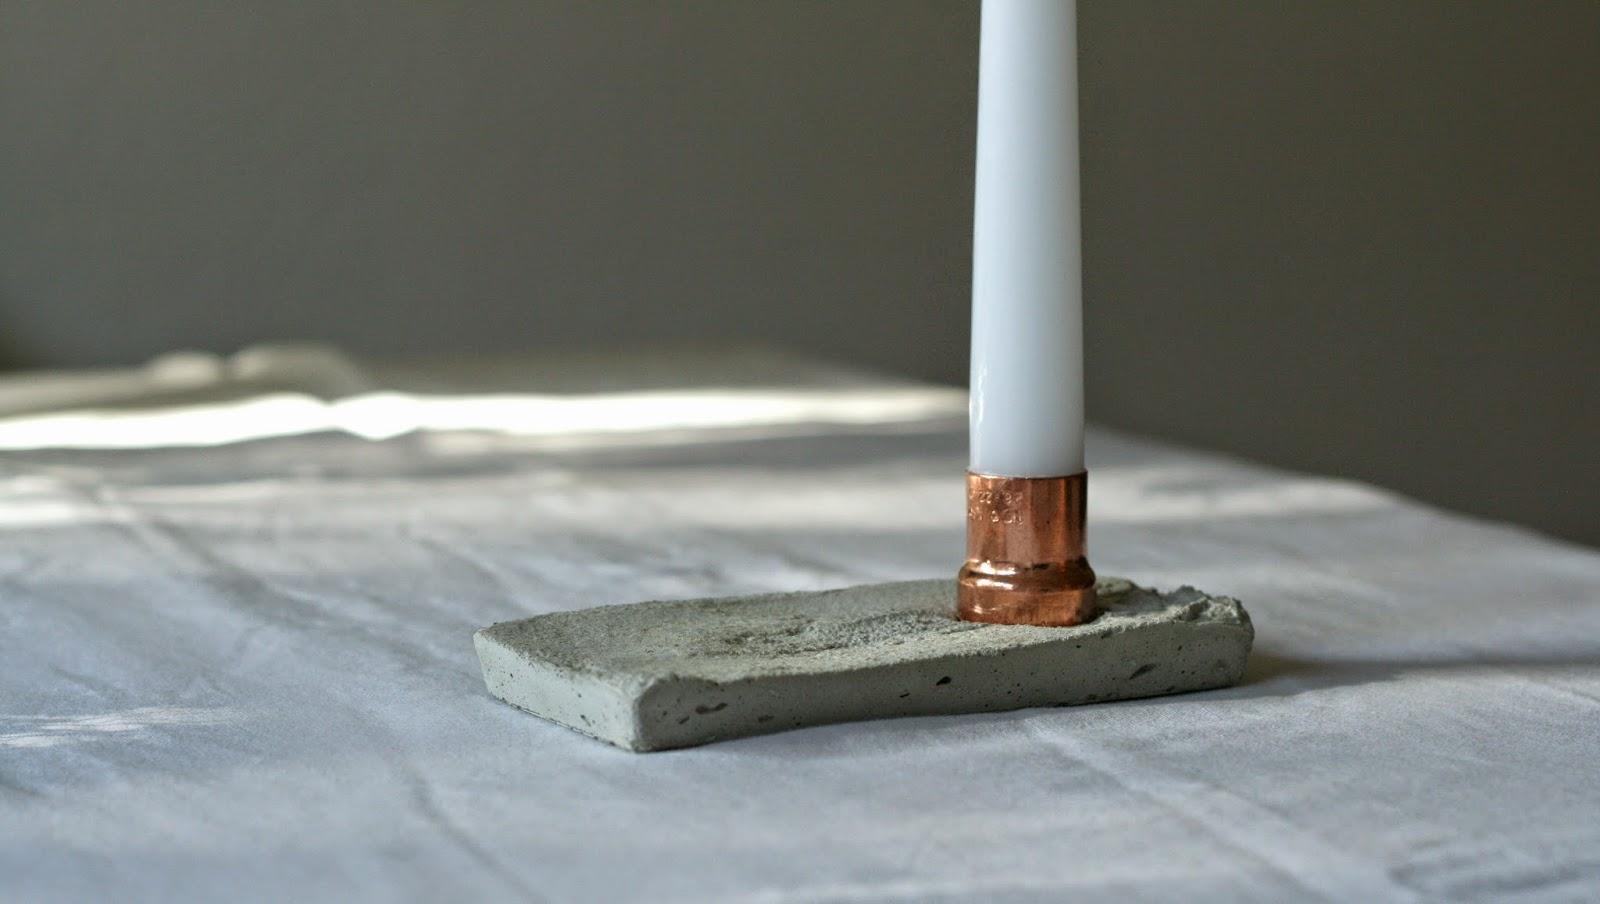 vida nullvier lieblingsmaterialien vereint beton kupfer. Black Bedroom Furniture Sets. Home Design Ideas